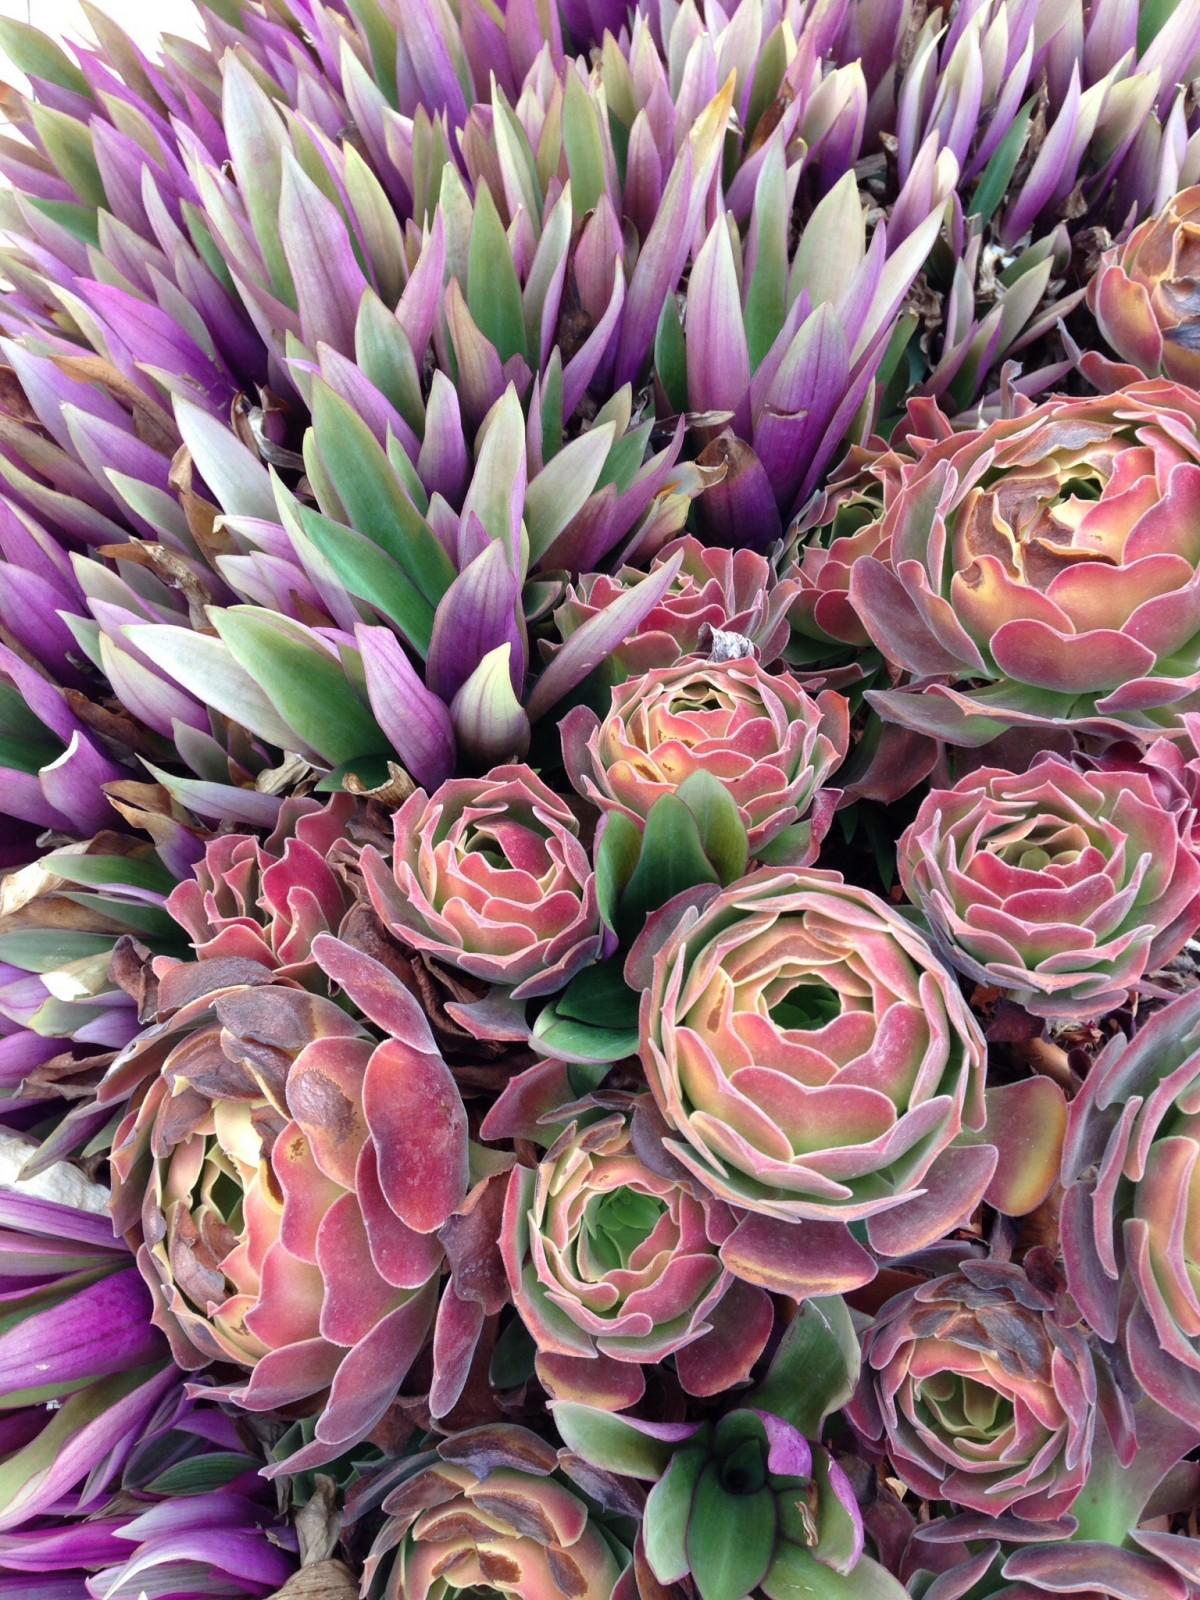 Free Images : cactus, purple, petal, mediterranean, produce, flora ...